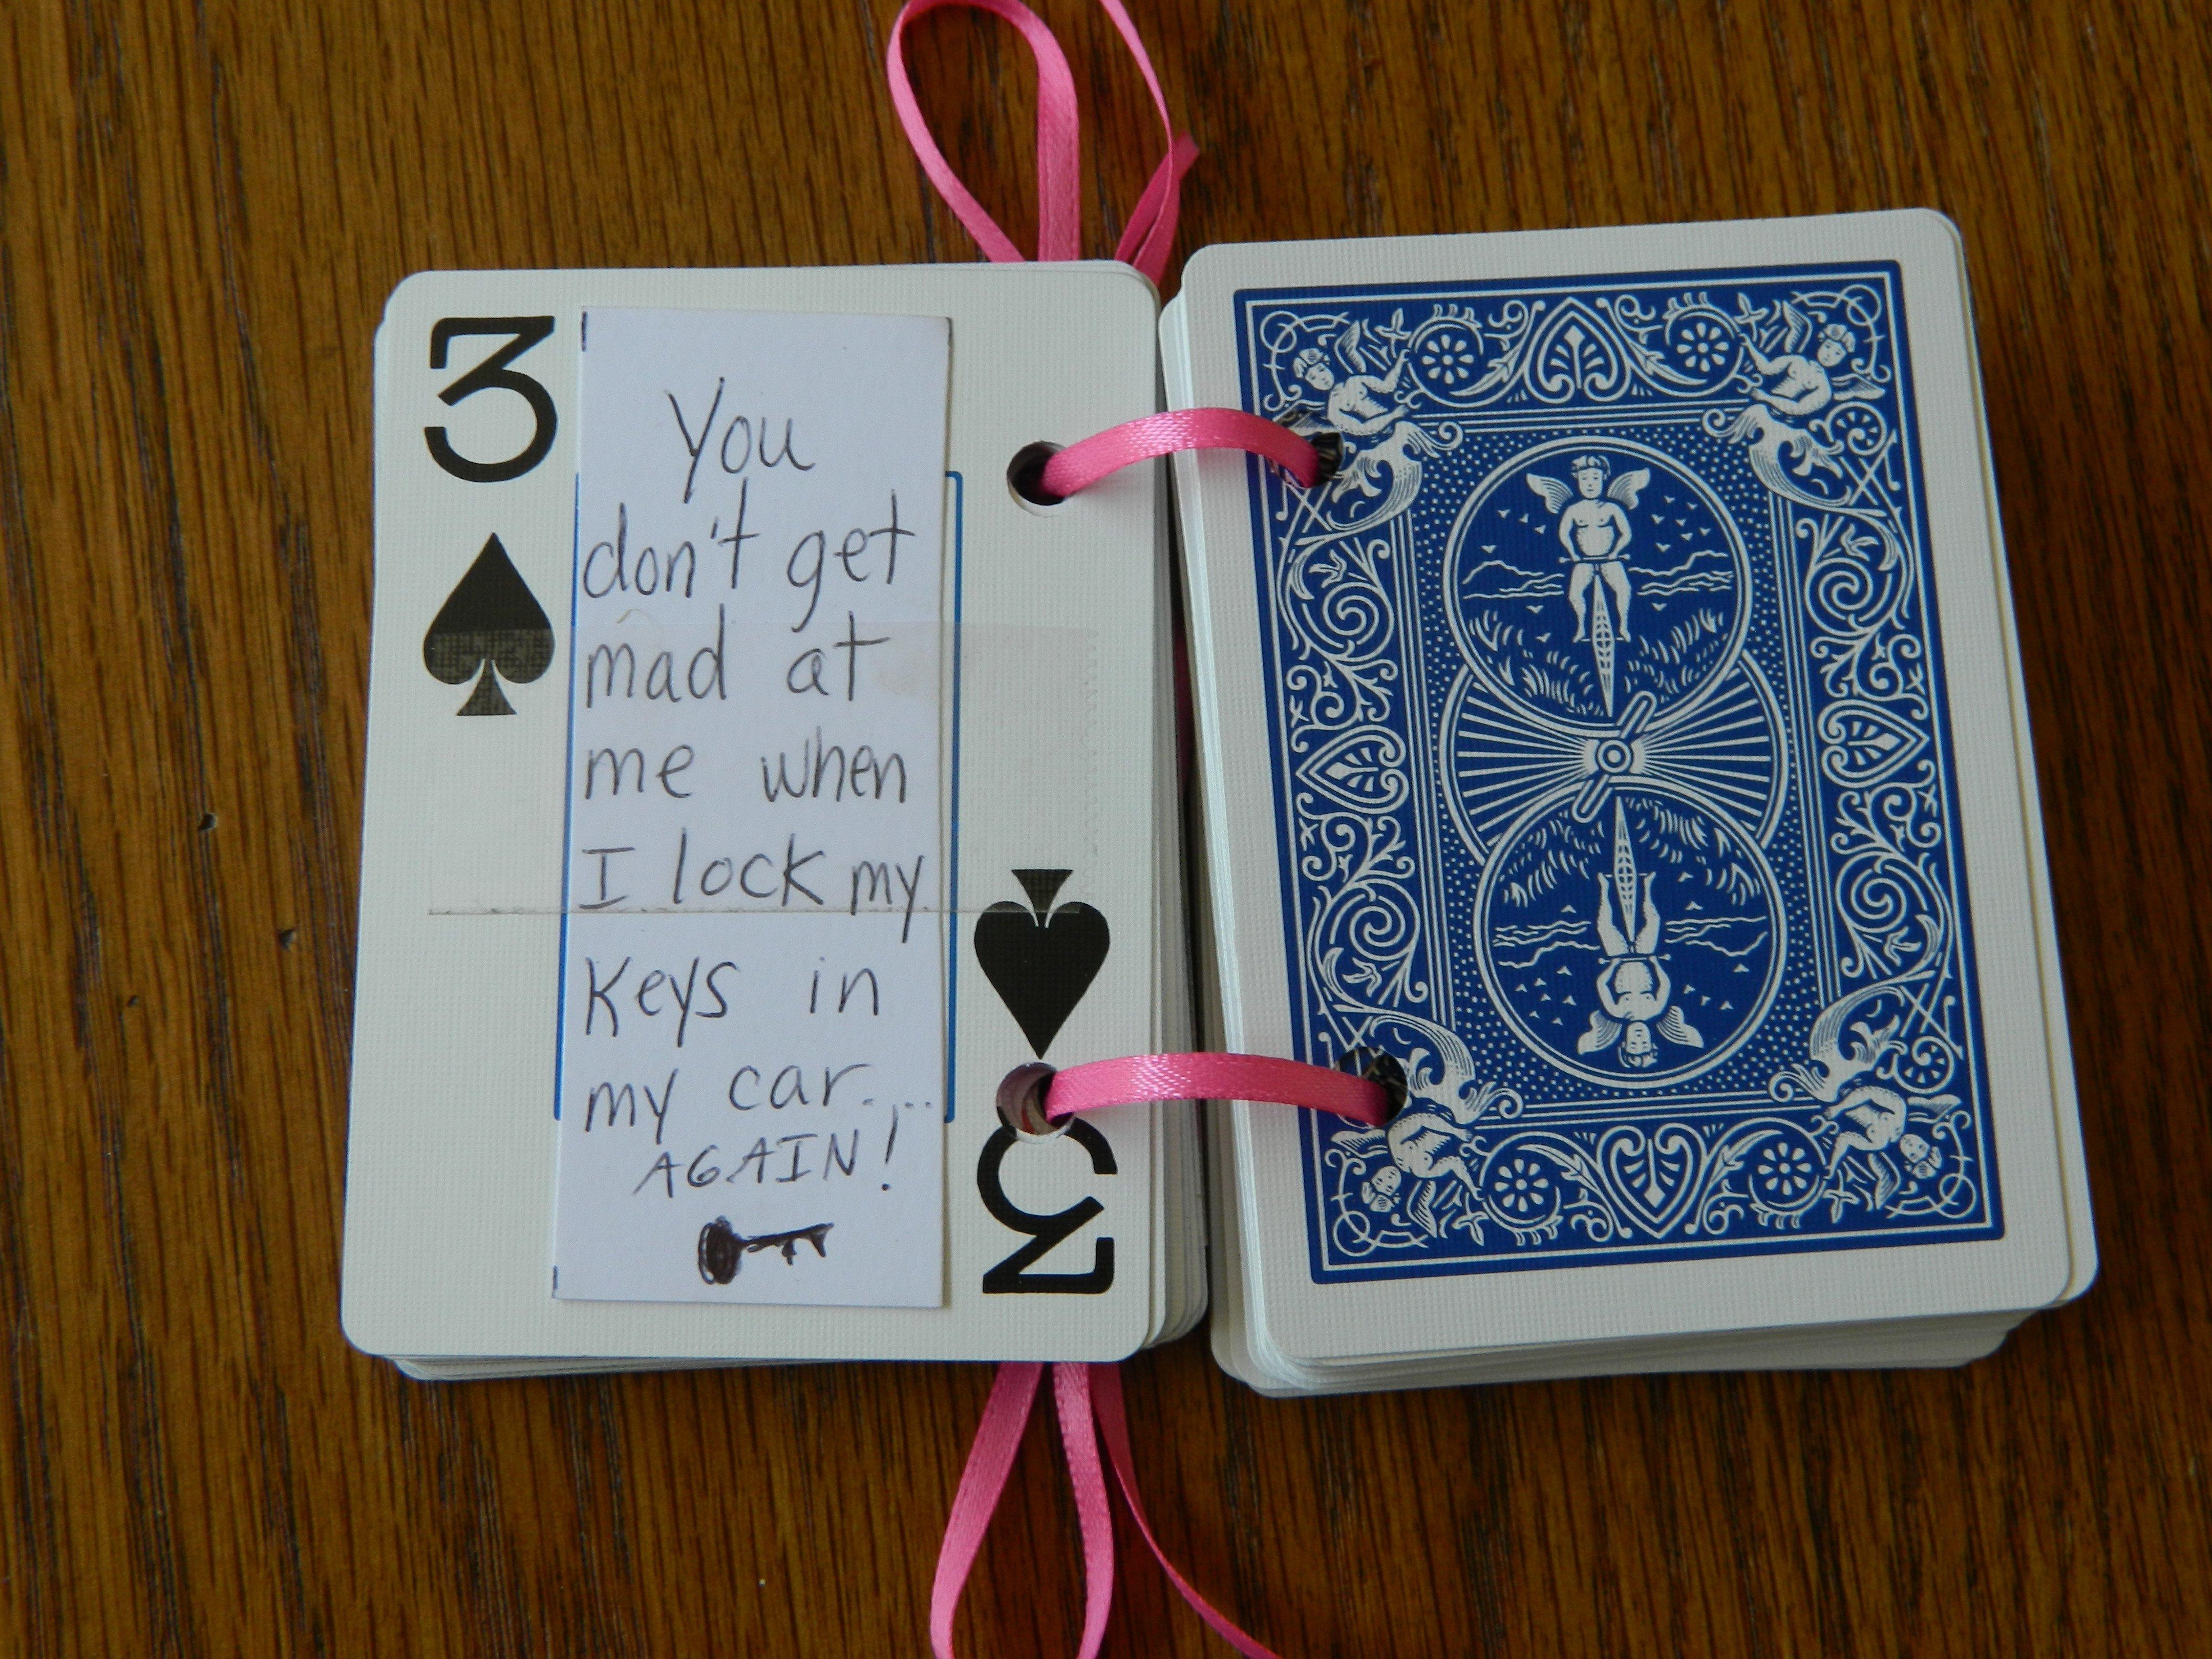 10 Famous Diy Gift Ideas For Best Friend sentimental graduation gifts friend gift ideas where it all began 5